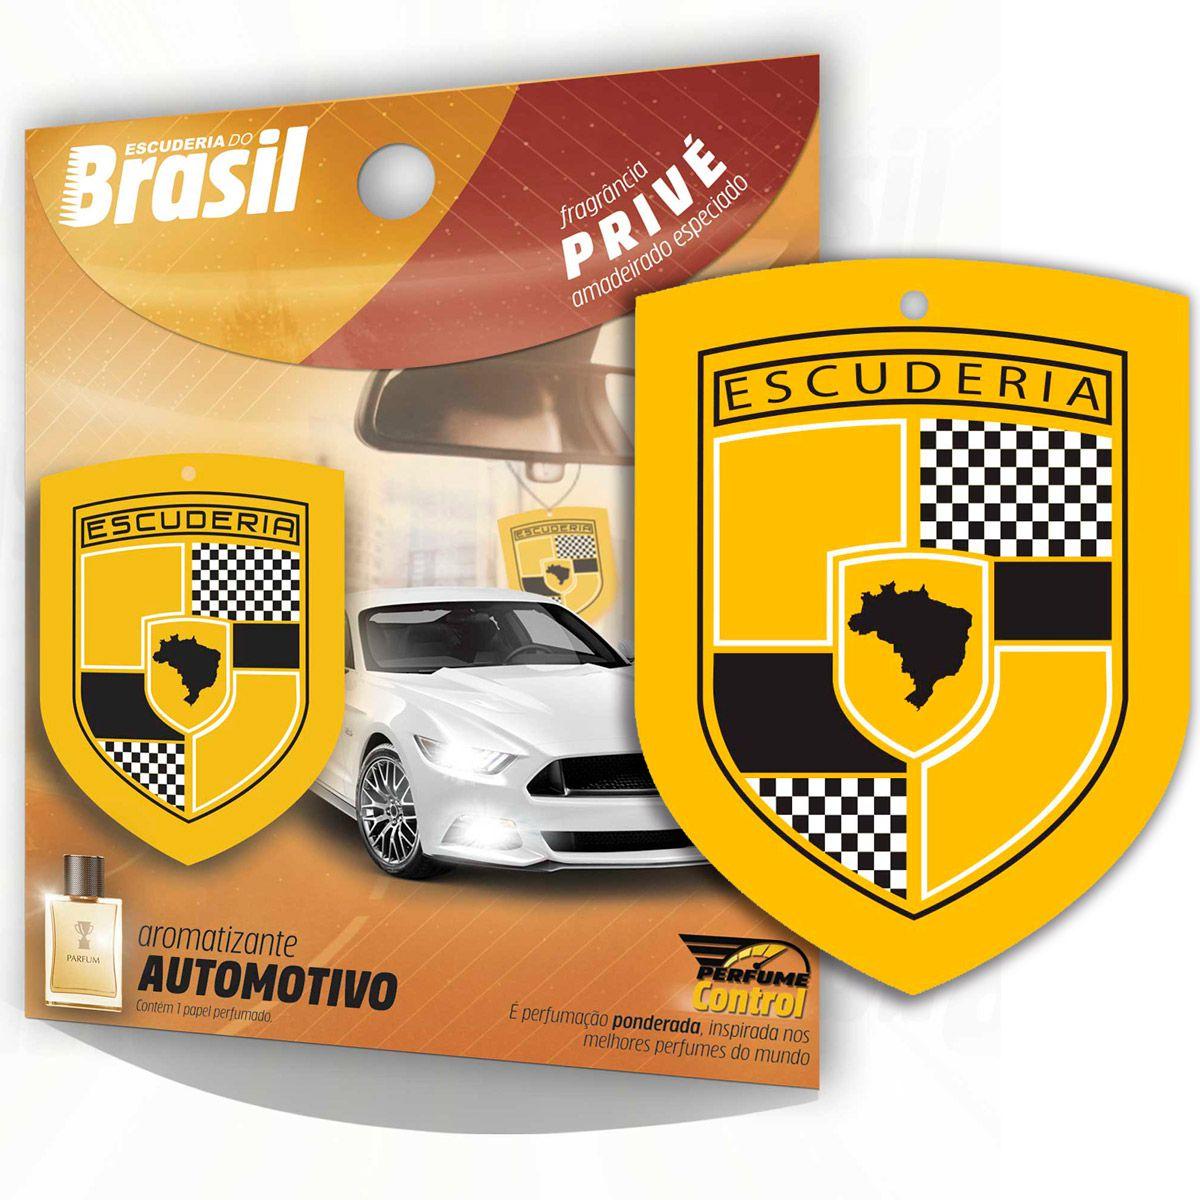 Aromatizante Automotivo Escuderia Brasil - Perfume Prive